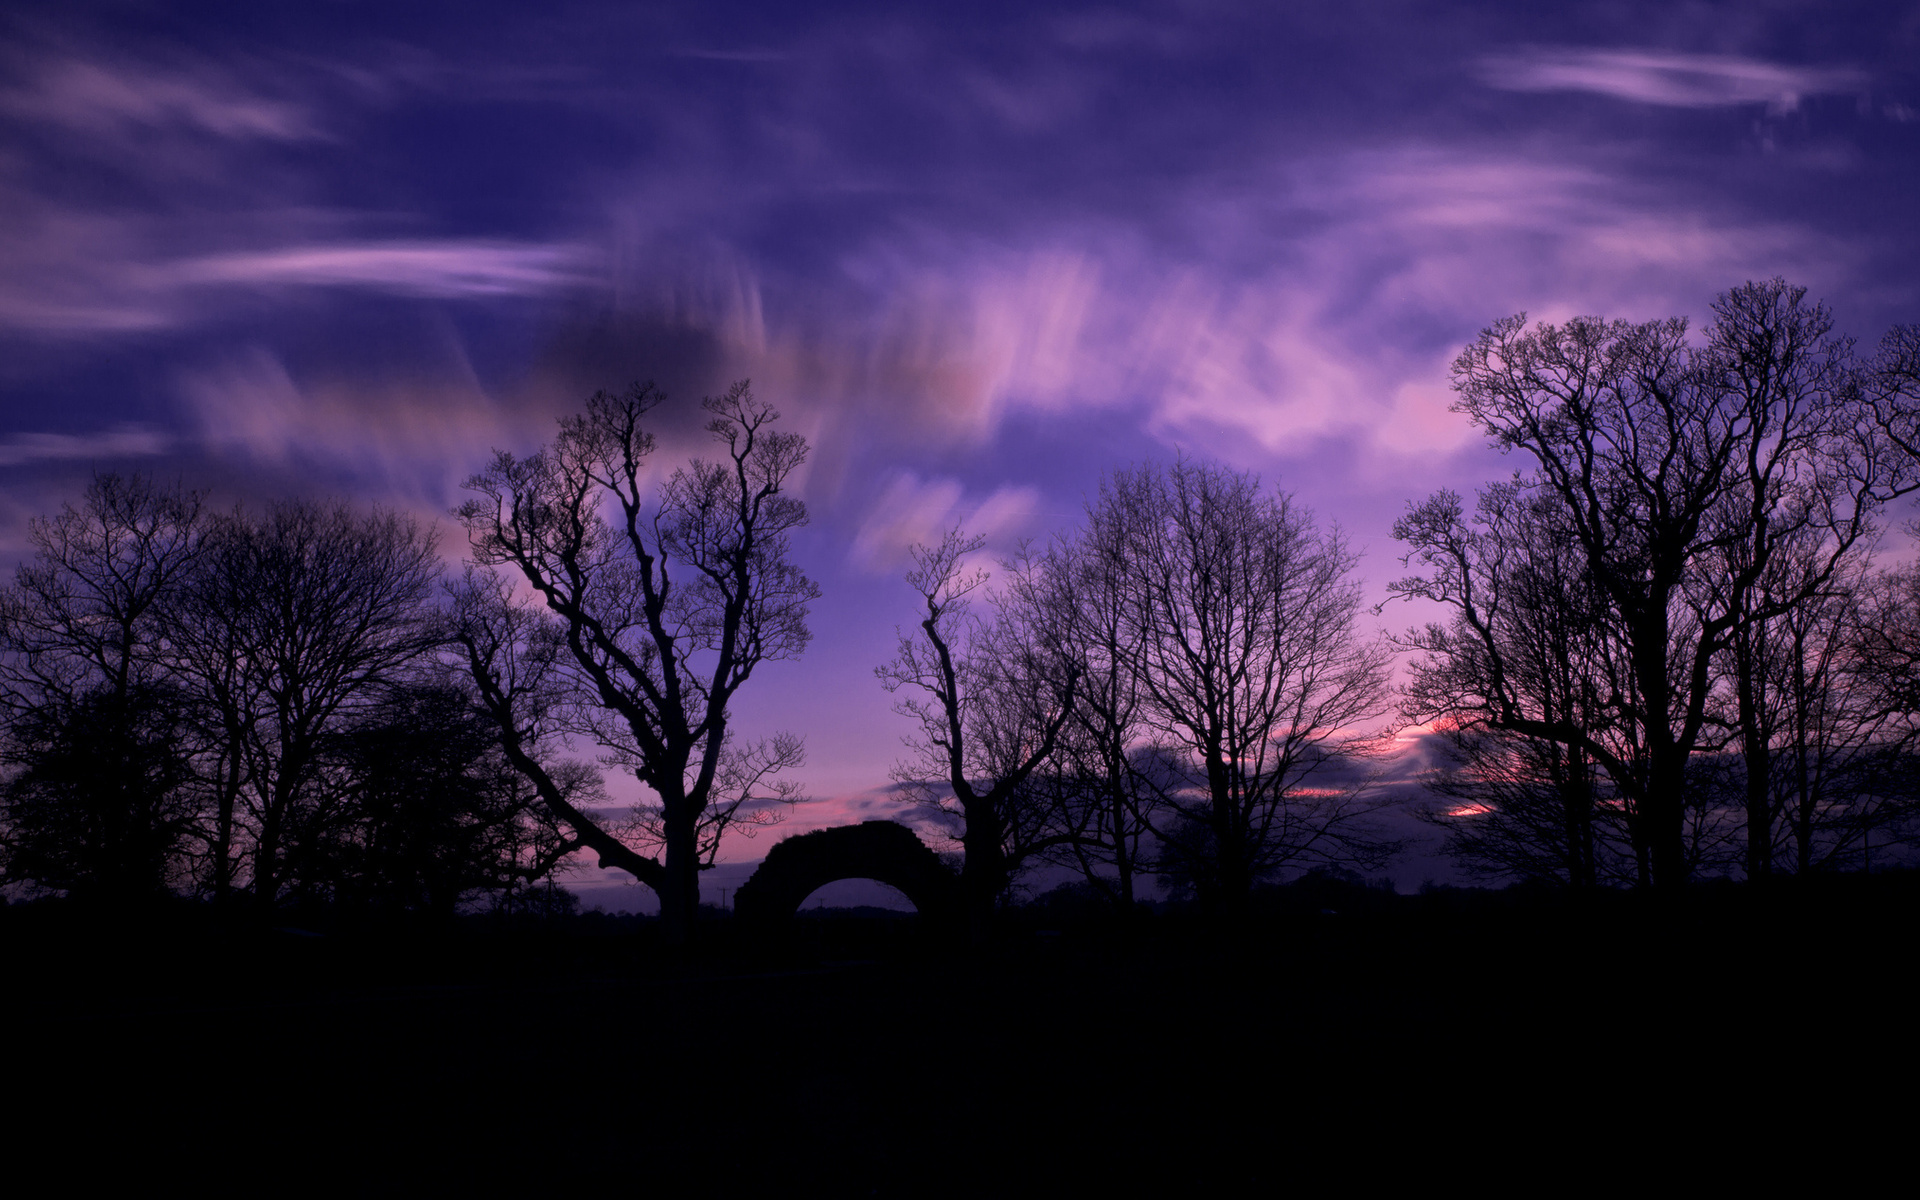 night tree wallpaper silhouette